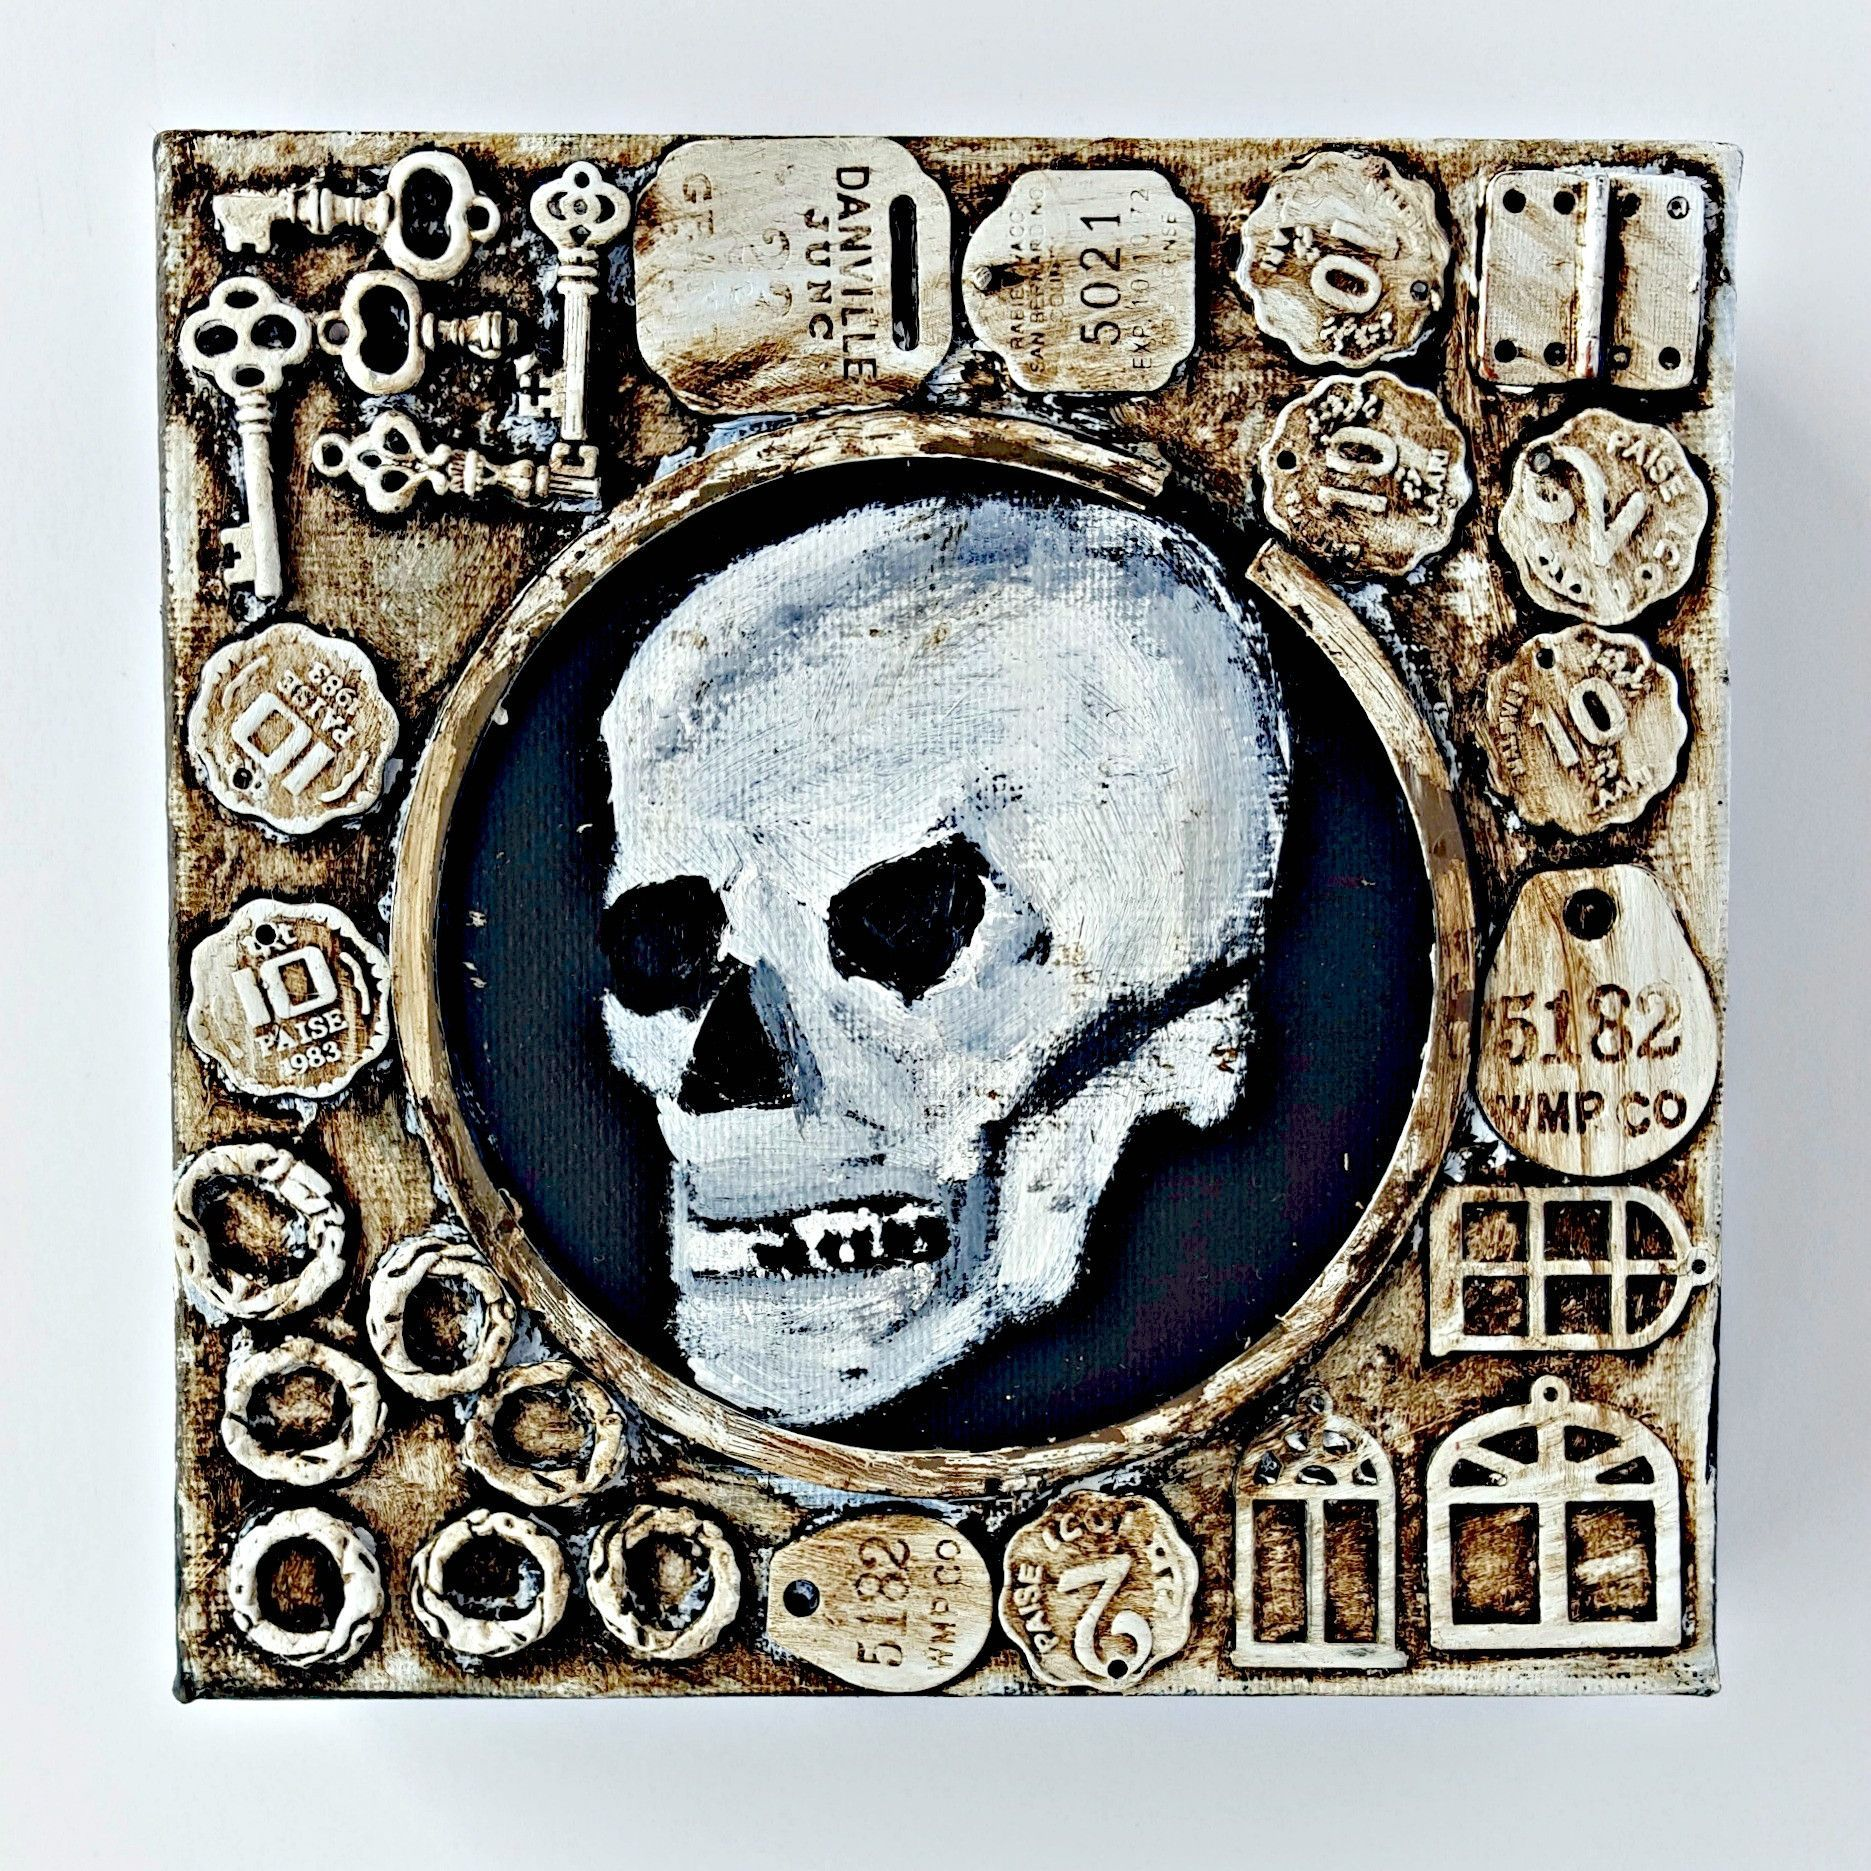 Human Skull in Scrap Metal Frame | Products | Pinterest | Human ...